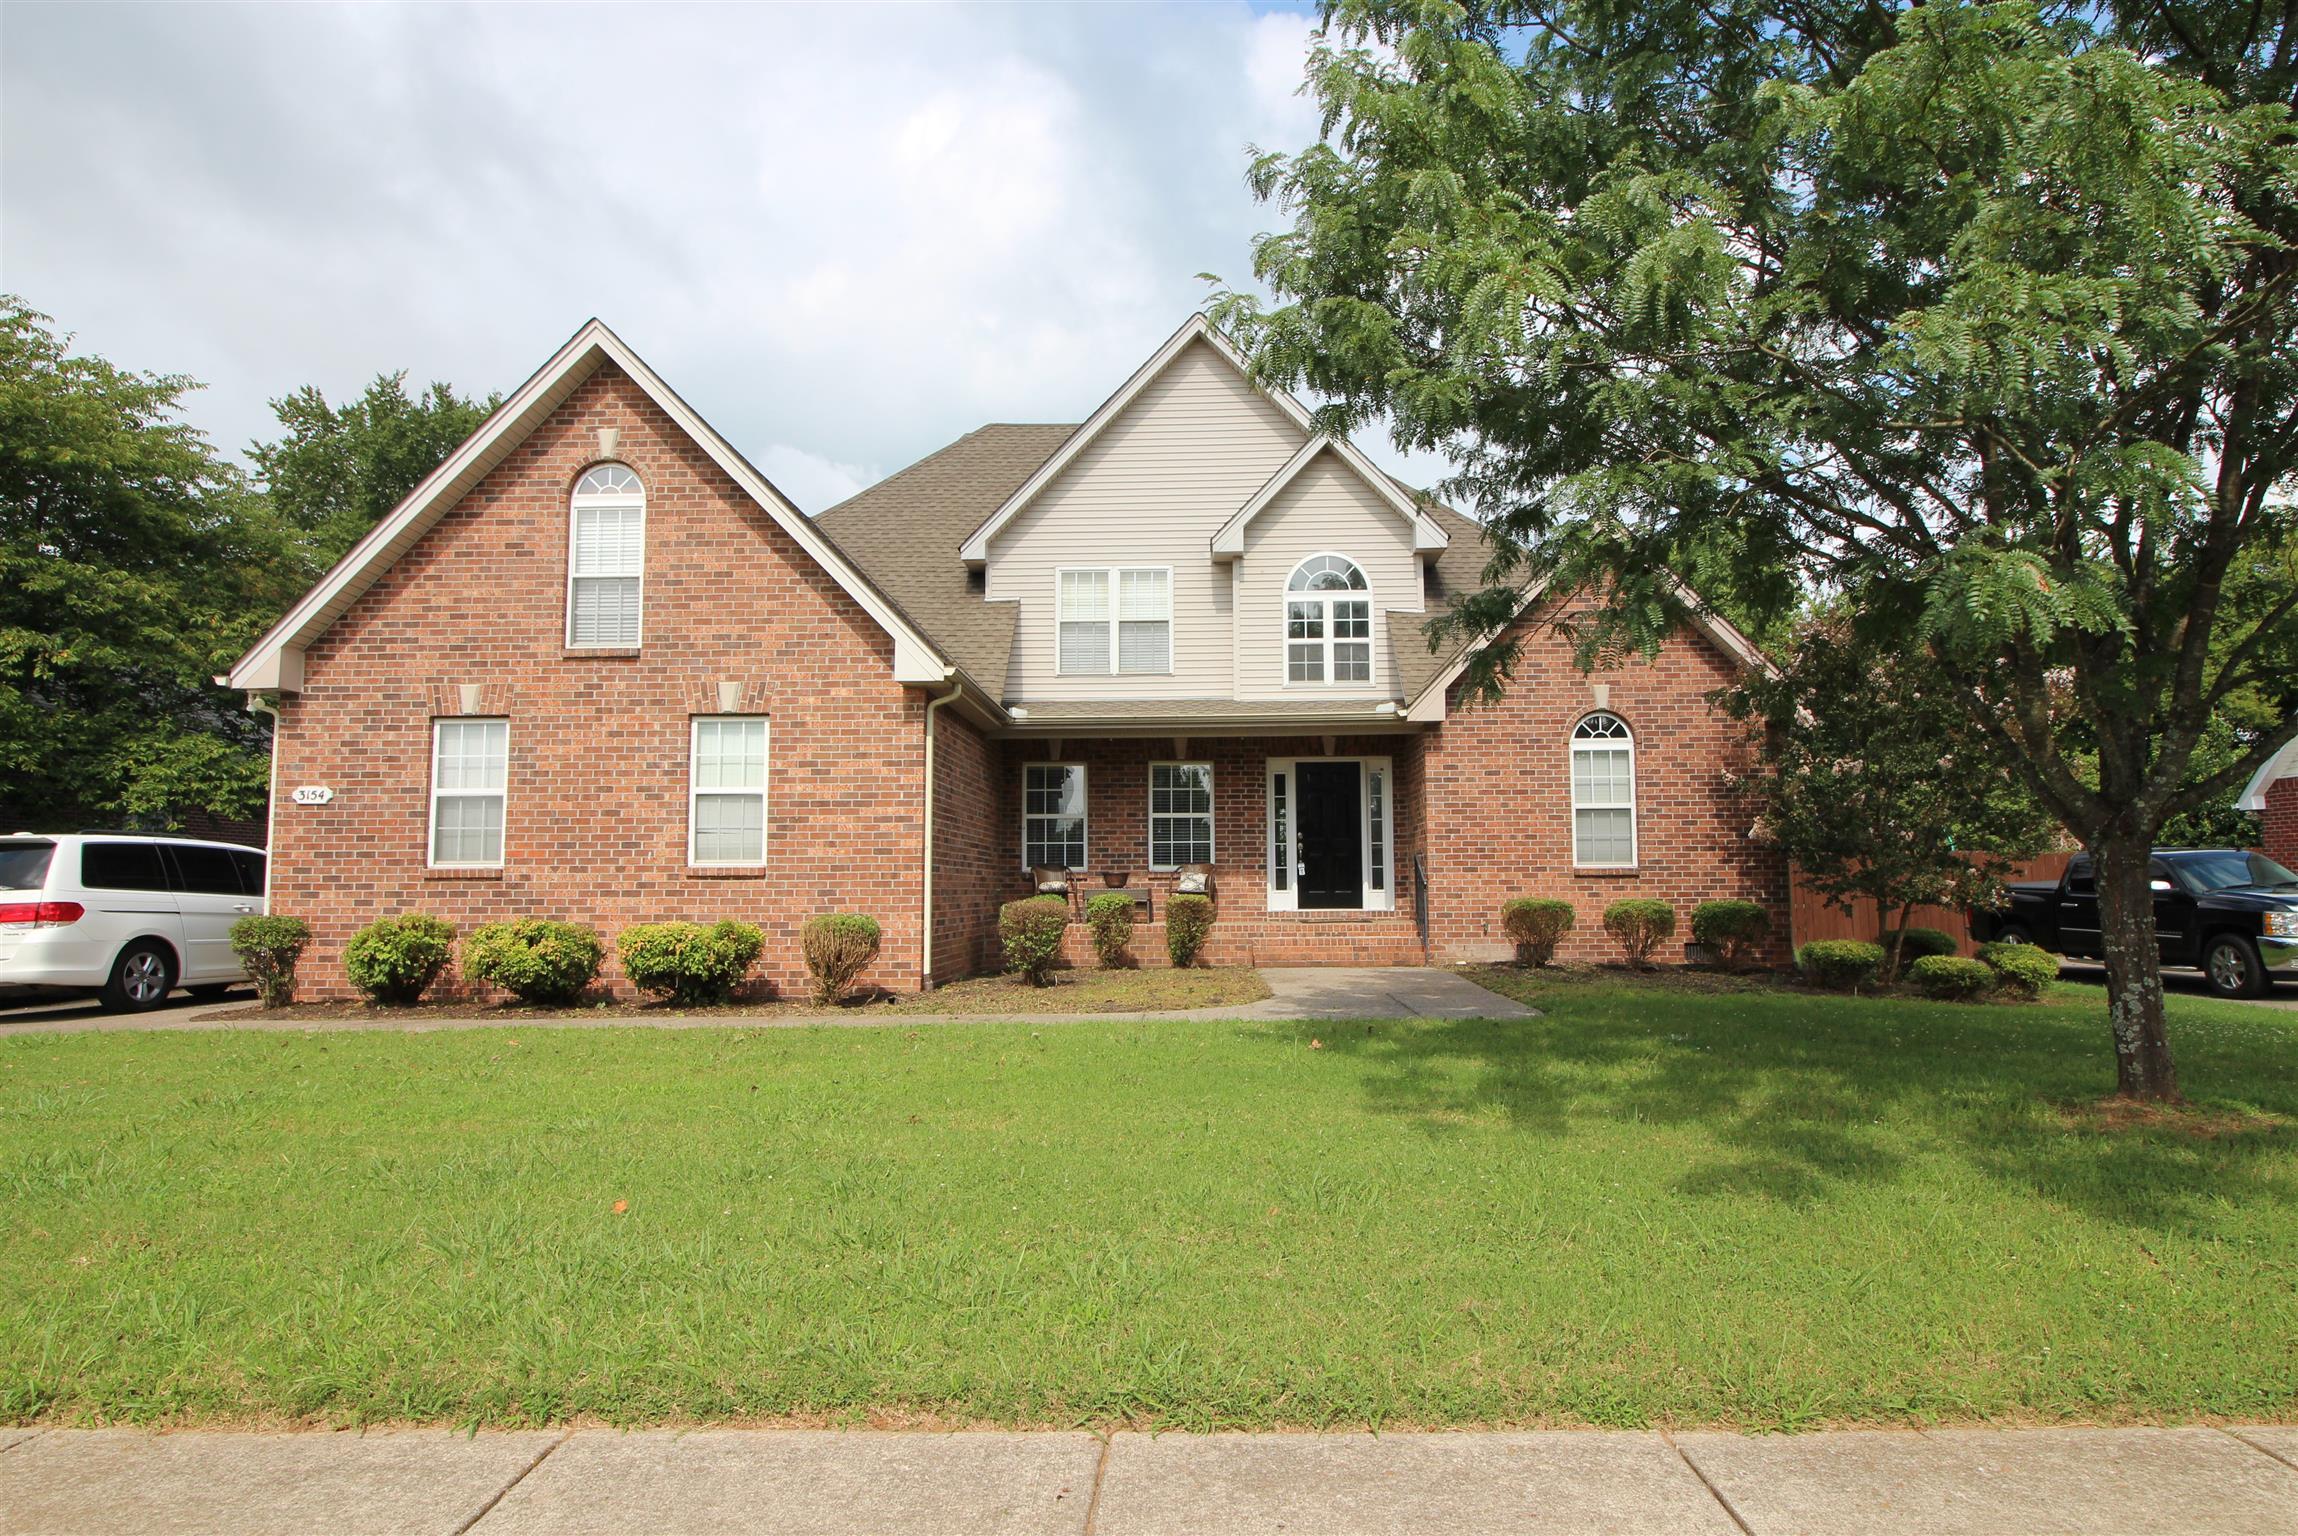 3154 Jenkins Dr, Murfreesboro, TN 37128 - Murfreesboro, TN real estate listing